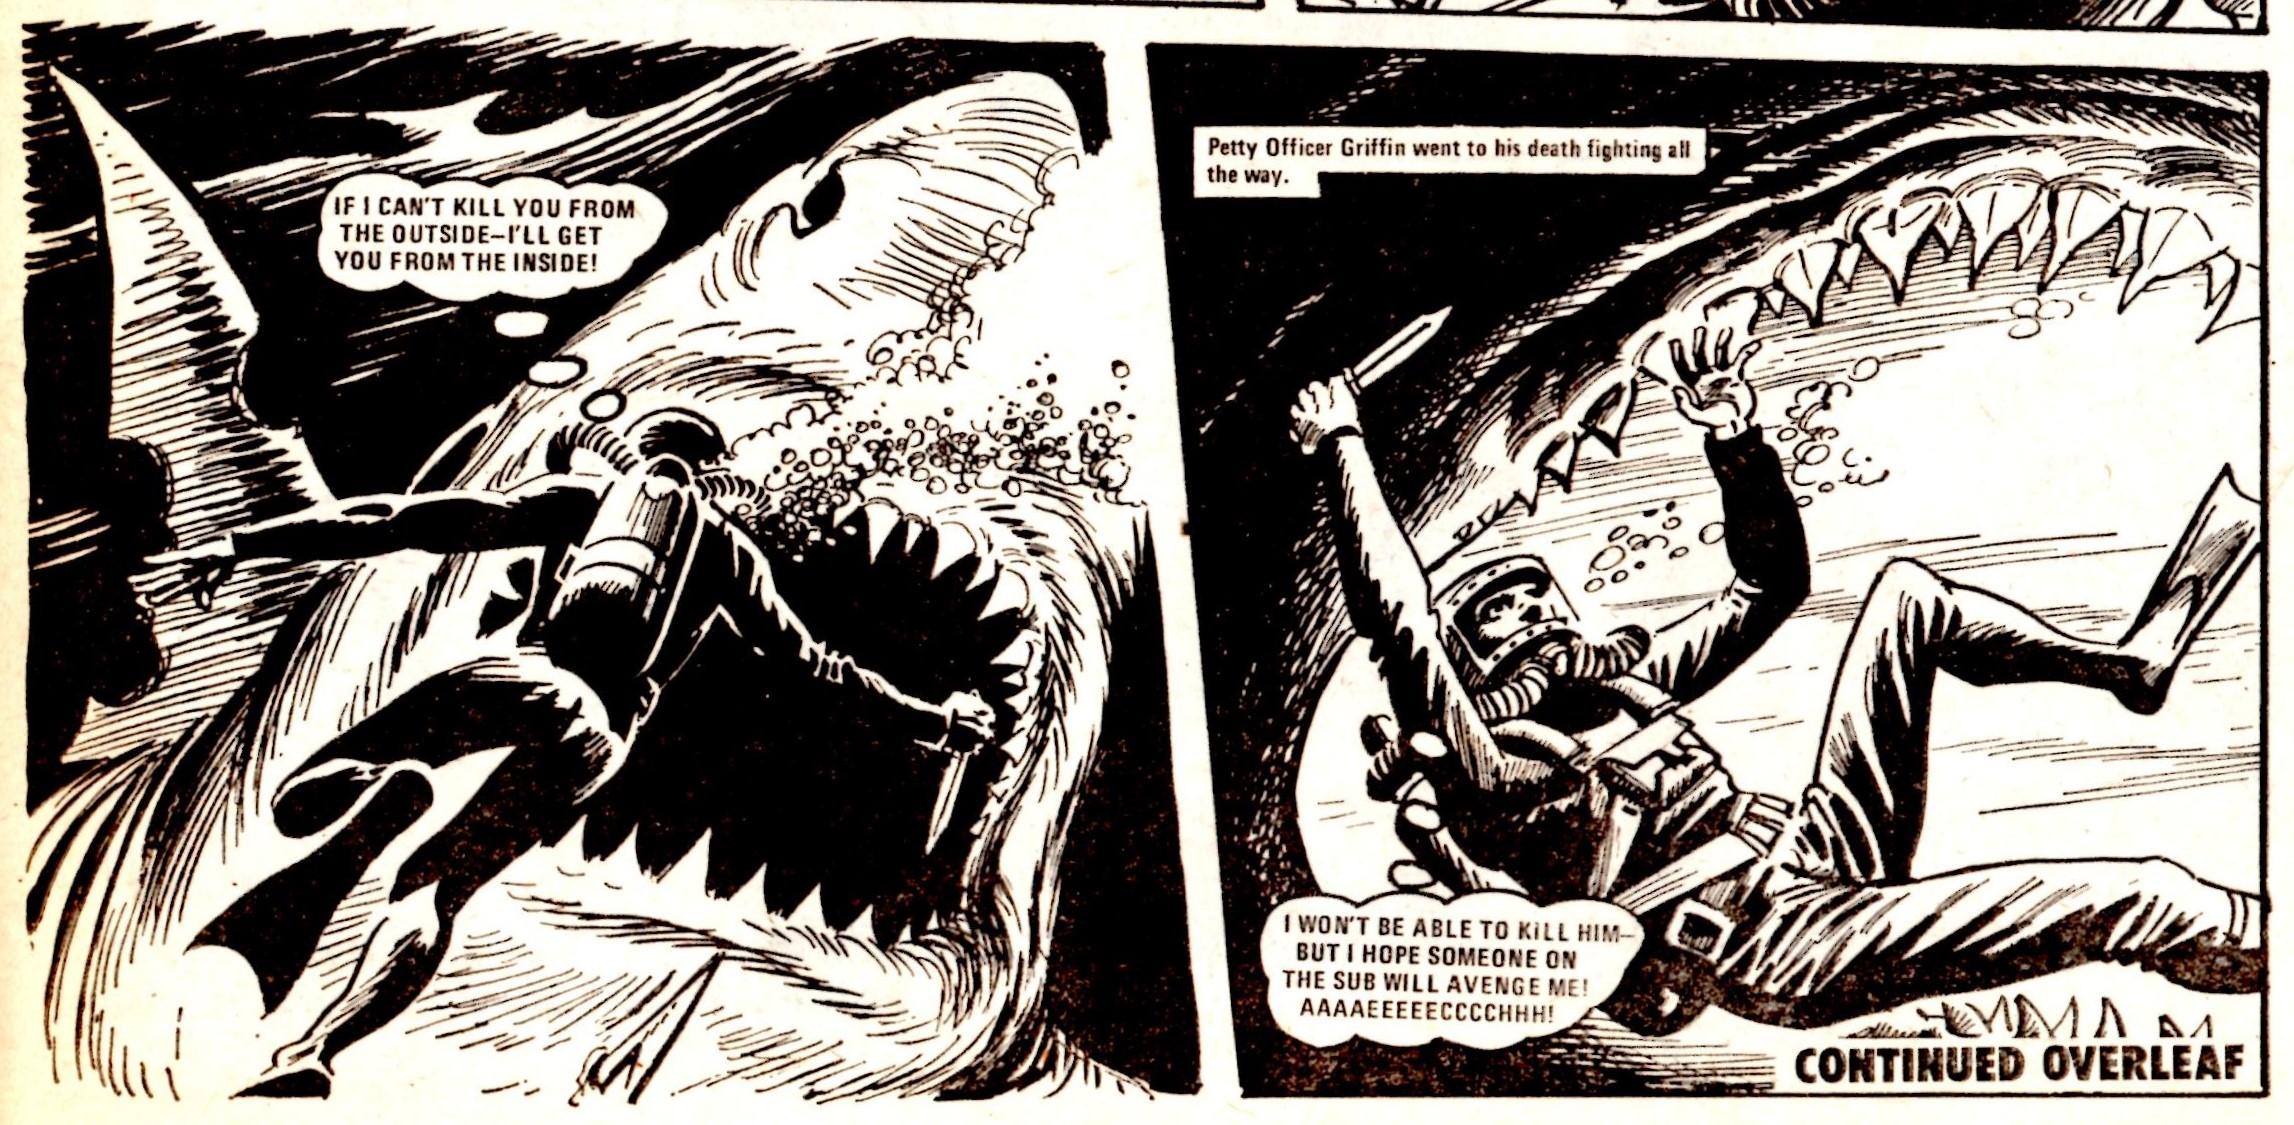 Hook Jaw: Ken Armstrong (writer), John Stokes? (artist)